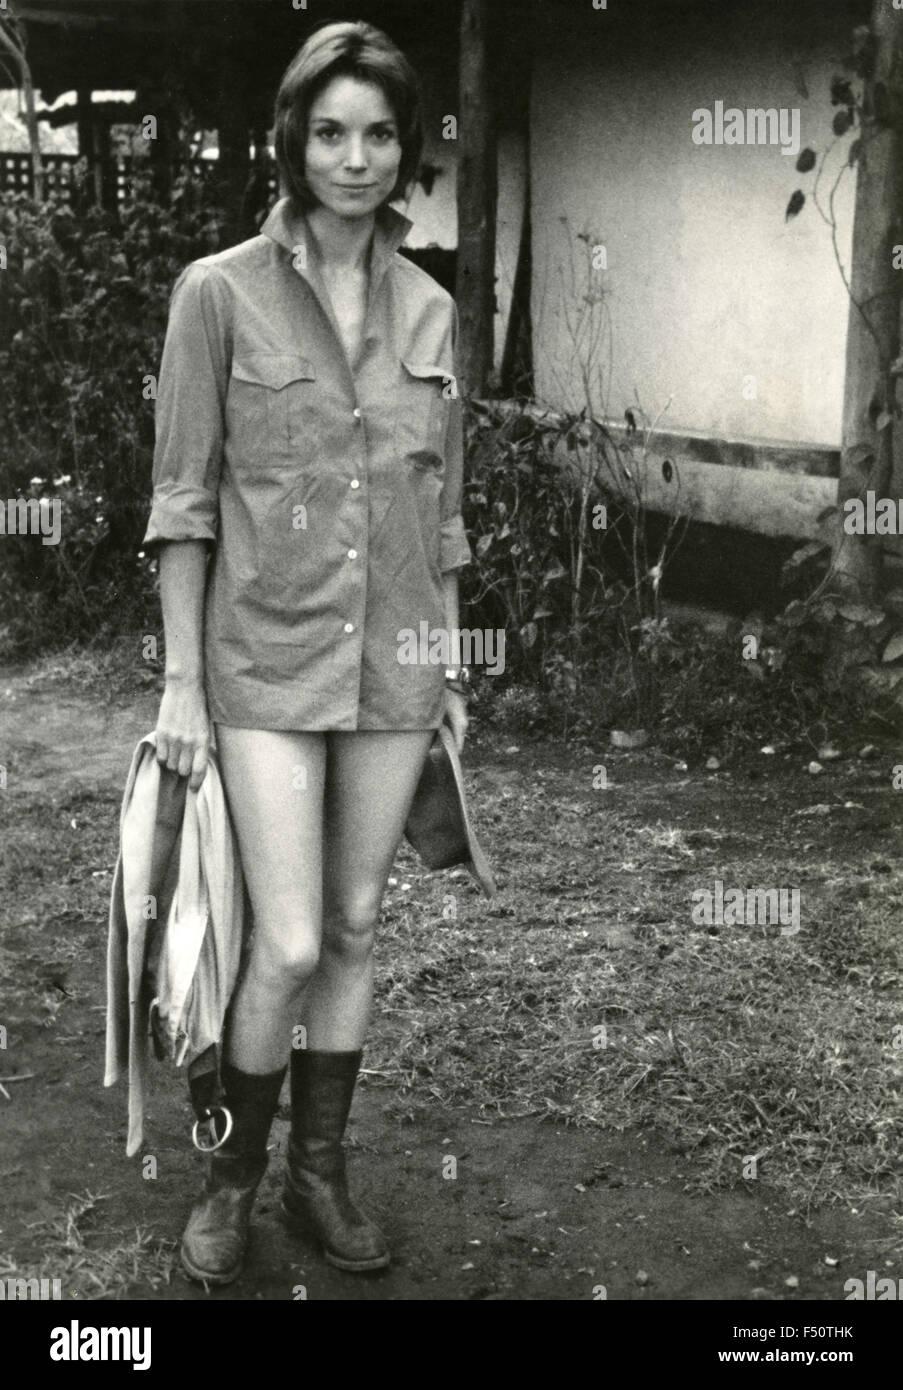 The Italian actress Elsa Martinelli in a scene from the movie 'Hatari!', USA - Stock Image